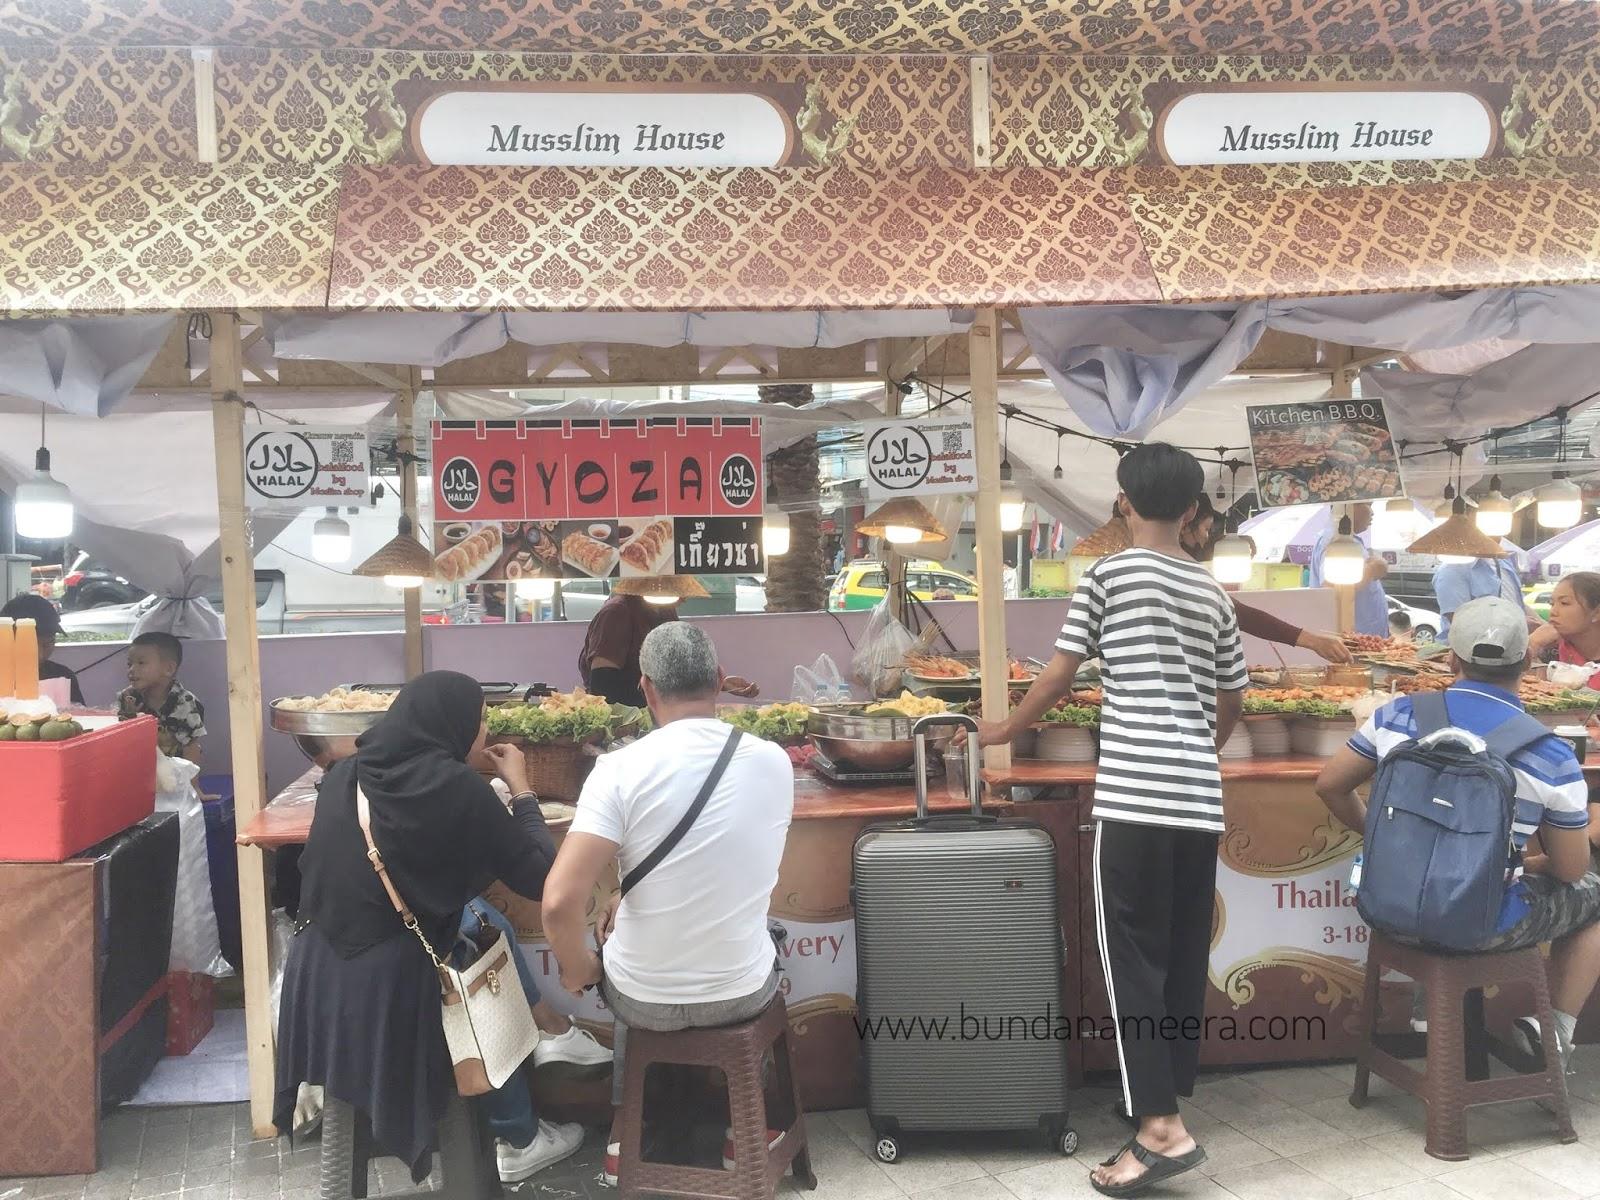 Restoran halal di Thailand, makanan halal yang ada di Bangkok, rekomendasi pilihan makanan halal di Bangkok, pengalaman mencari makanan halal di Bangkok